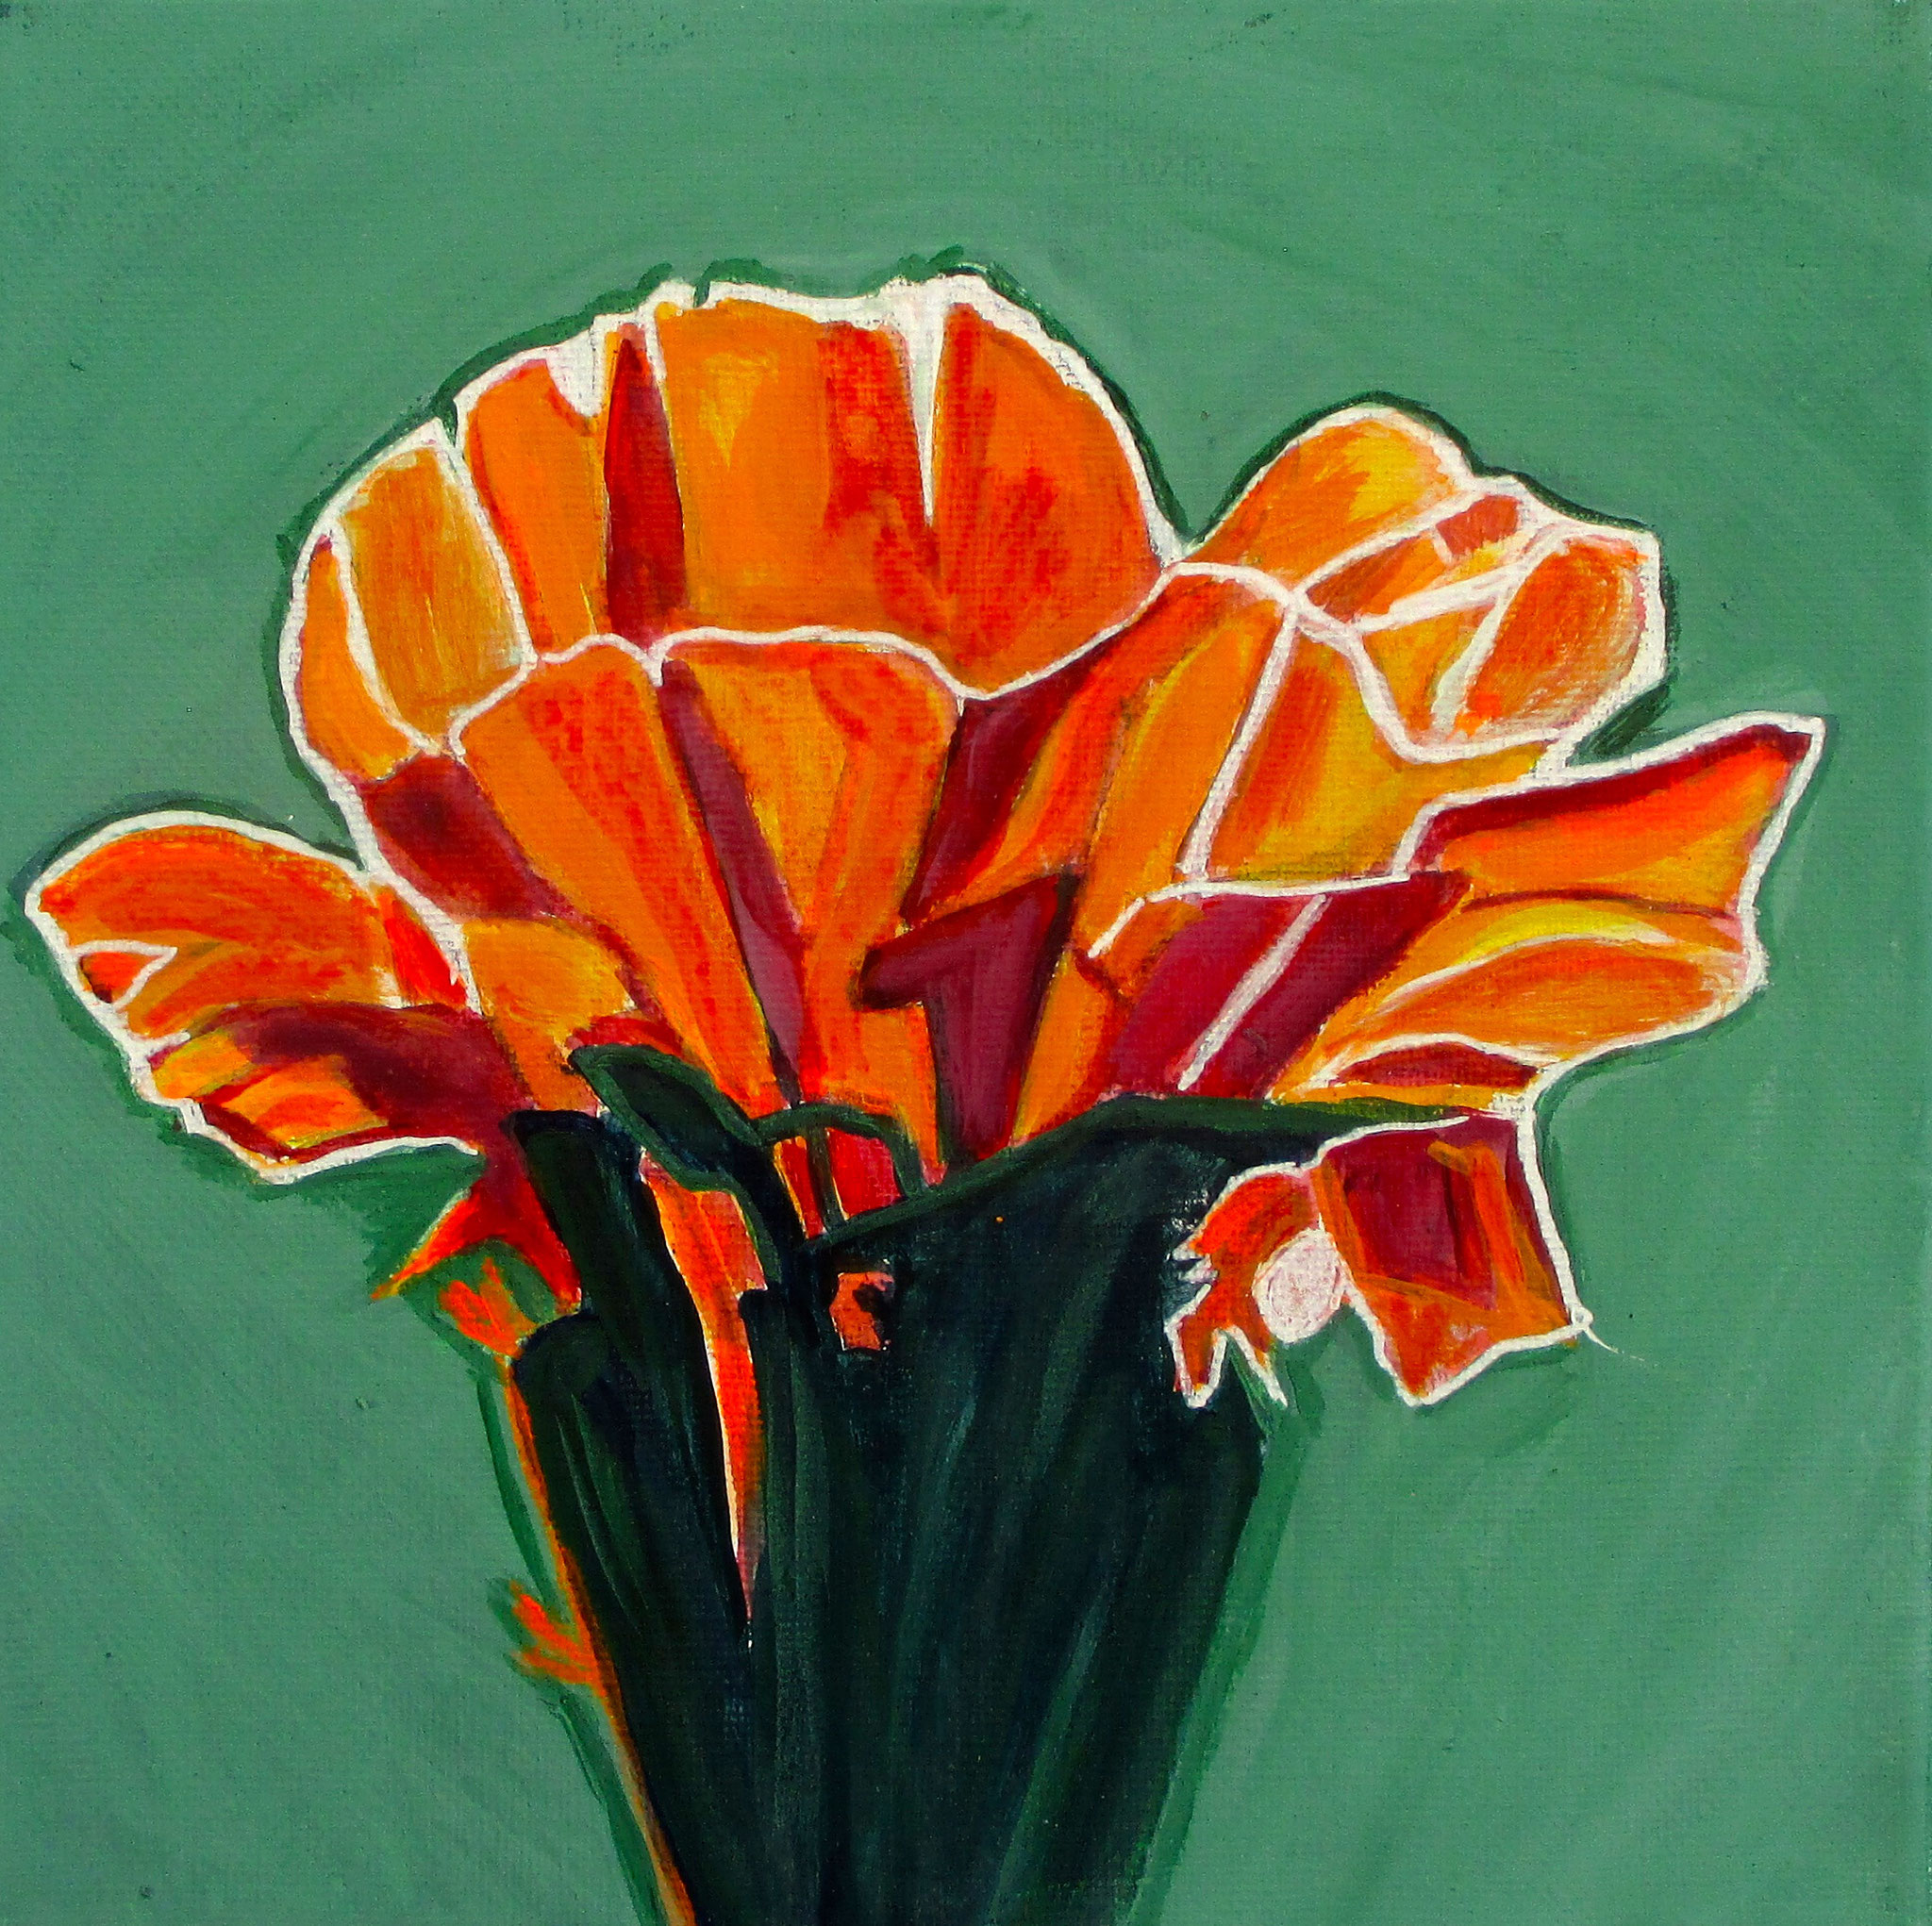 Apricot Glow, acrylic on canvas, 8 x 8